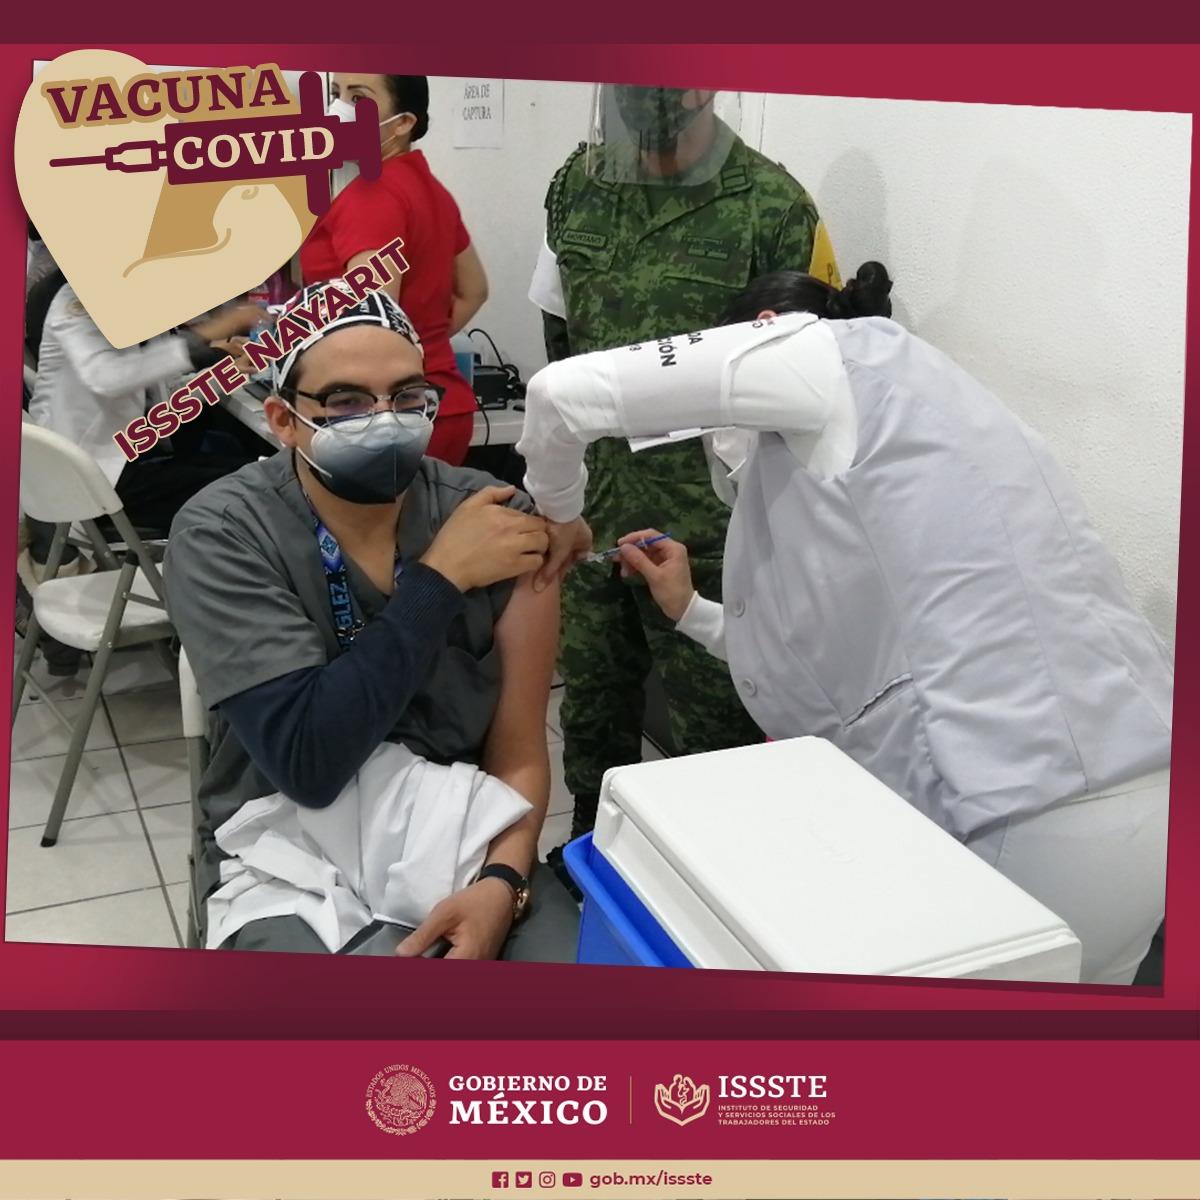 nayarit-issste-vacuna